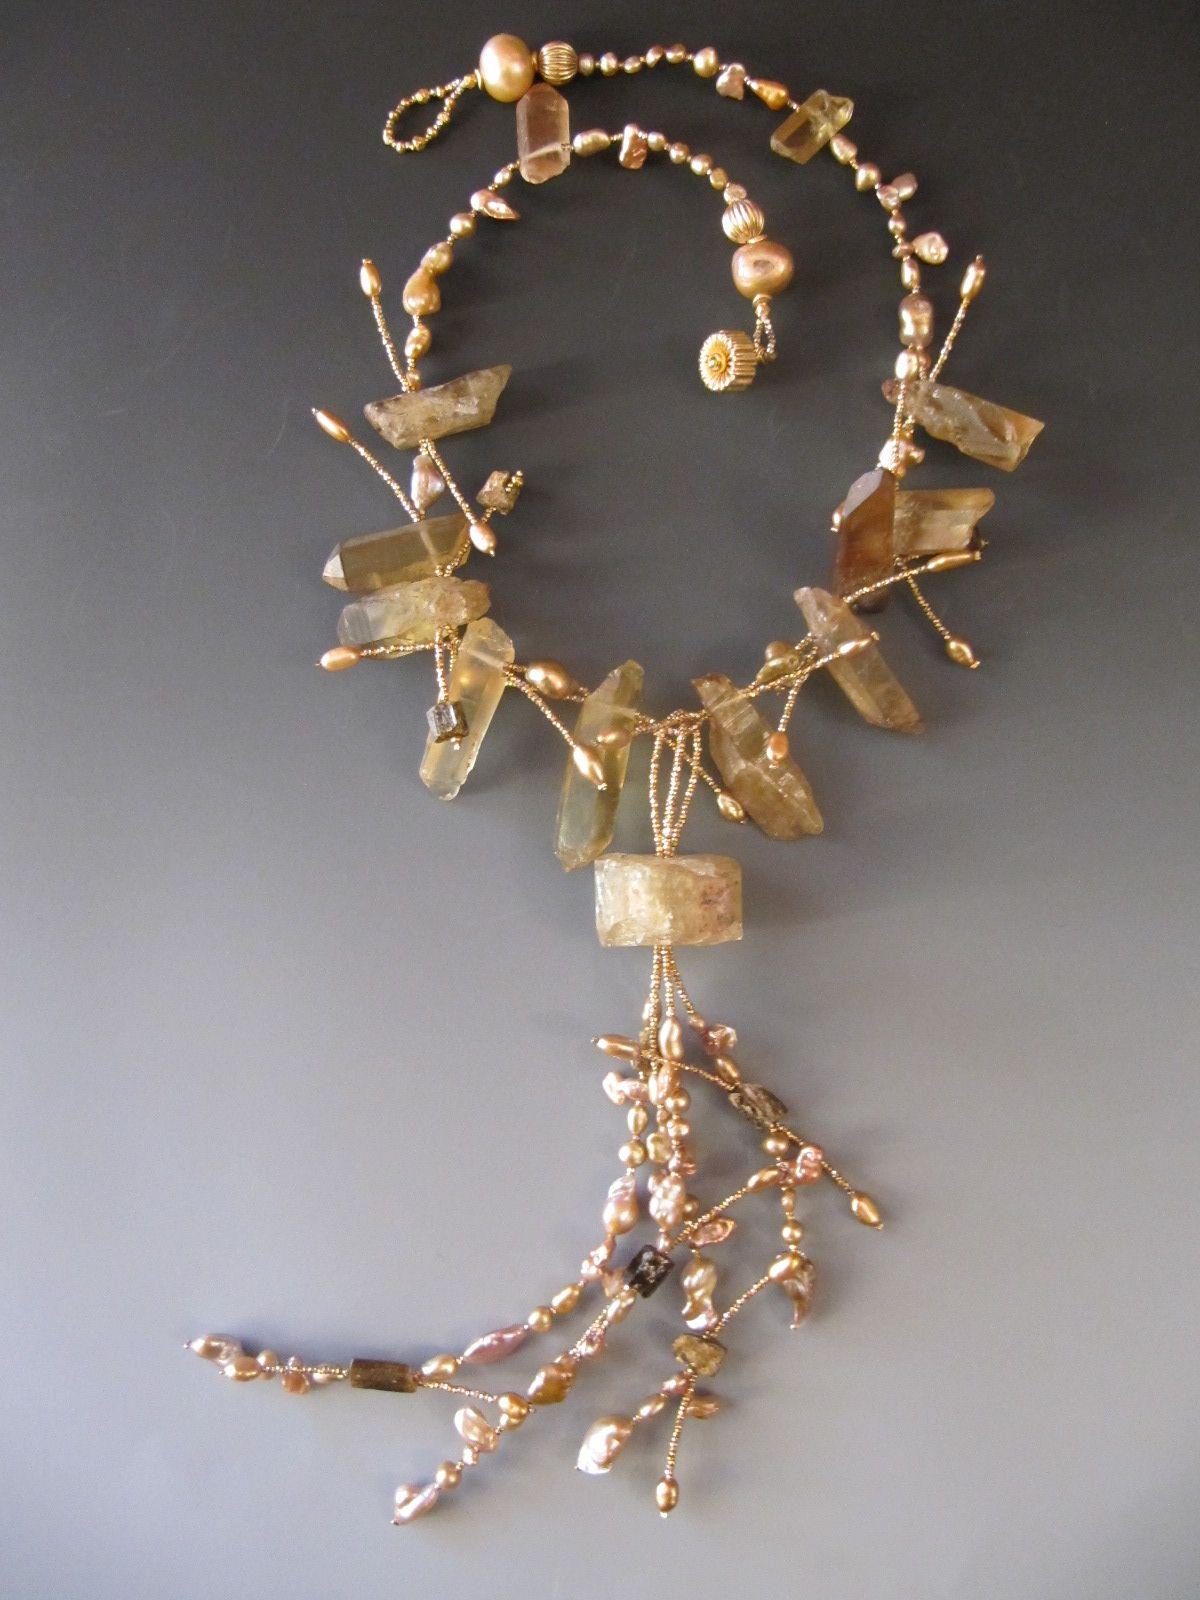 Apetite Crystal, quartz crystals, brown tourmaline crystals,keshi pearls...LuciaAntonelli.com